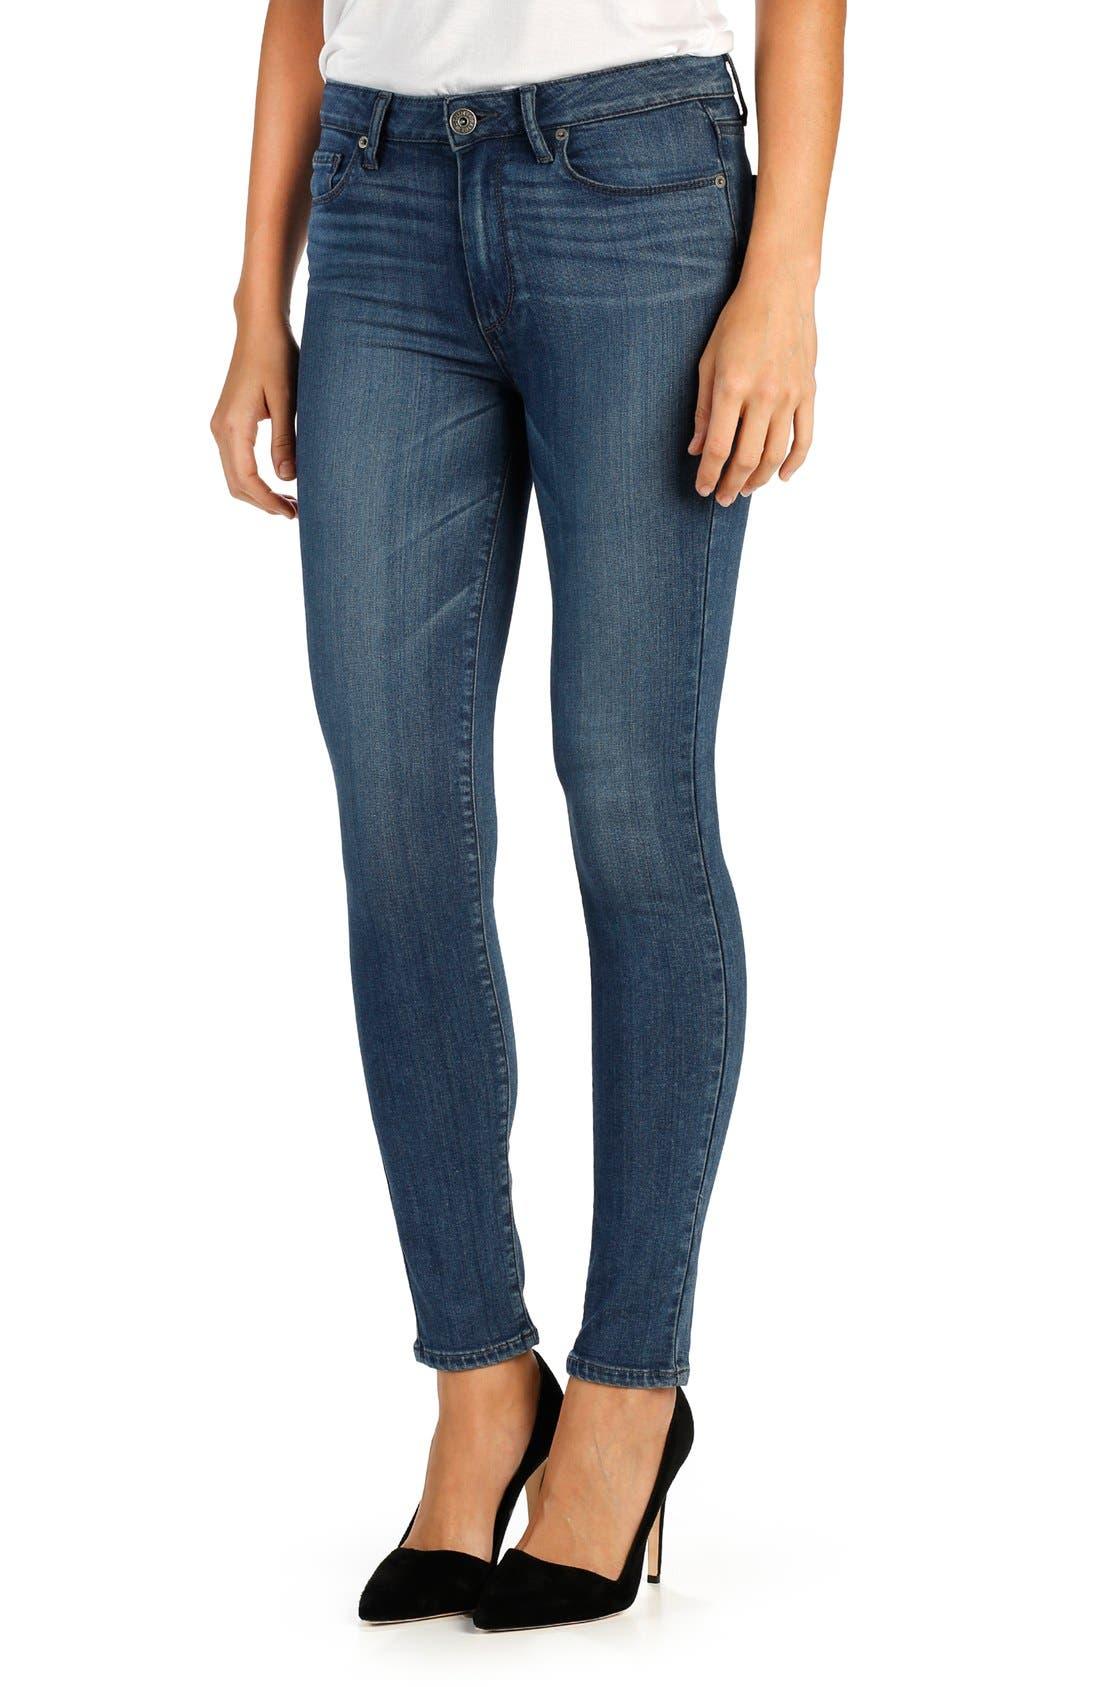 'Transcend - Hoxton' High Rise Ankle Peg Skinny Jeans,                             Main thumbnail 1, color,                             400